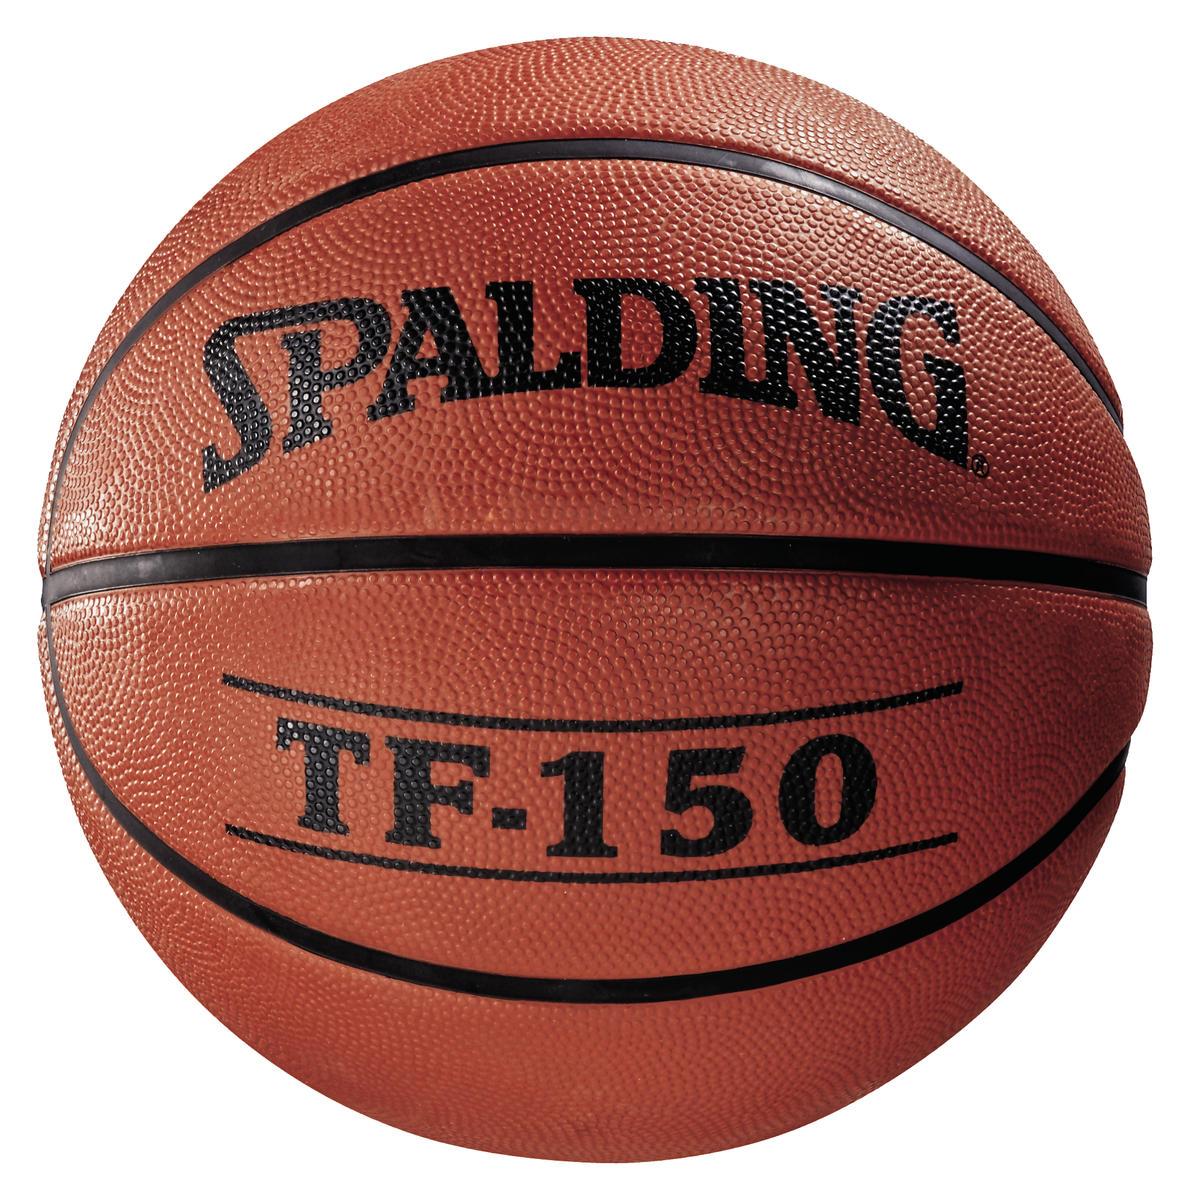 Basketboll Spalding TF 250 stl 6 - Lekolar Sverige ff1ced7eccad5